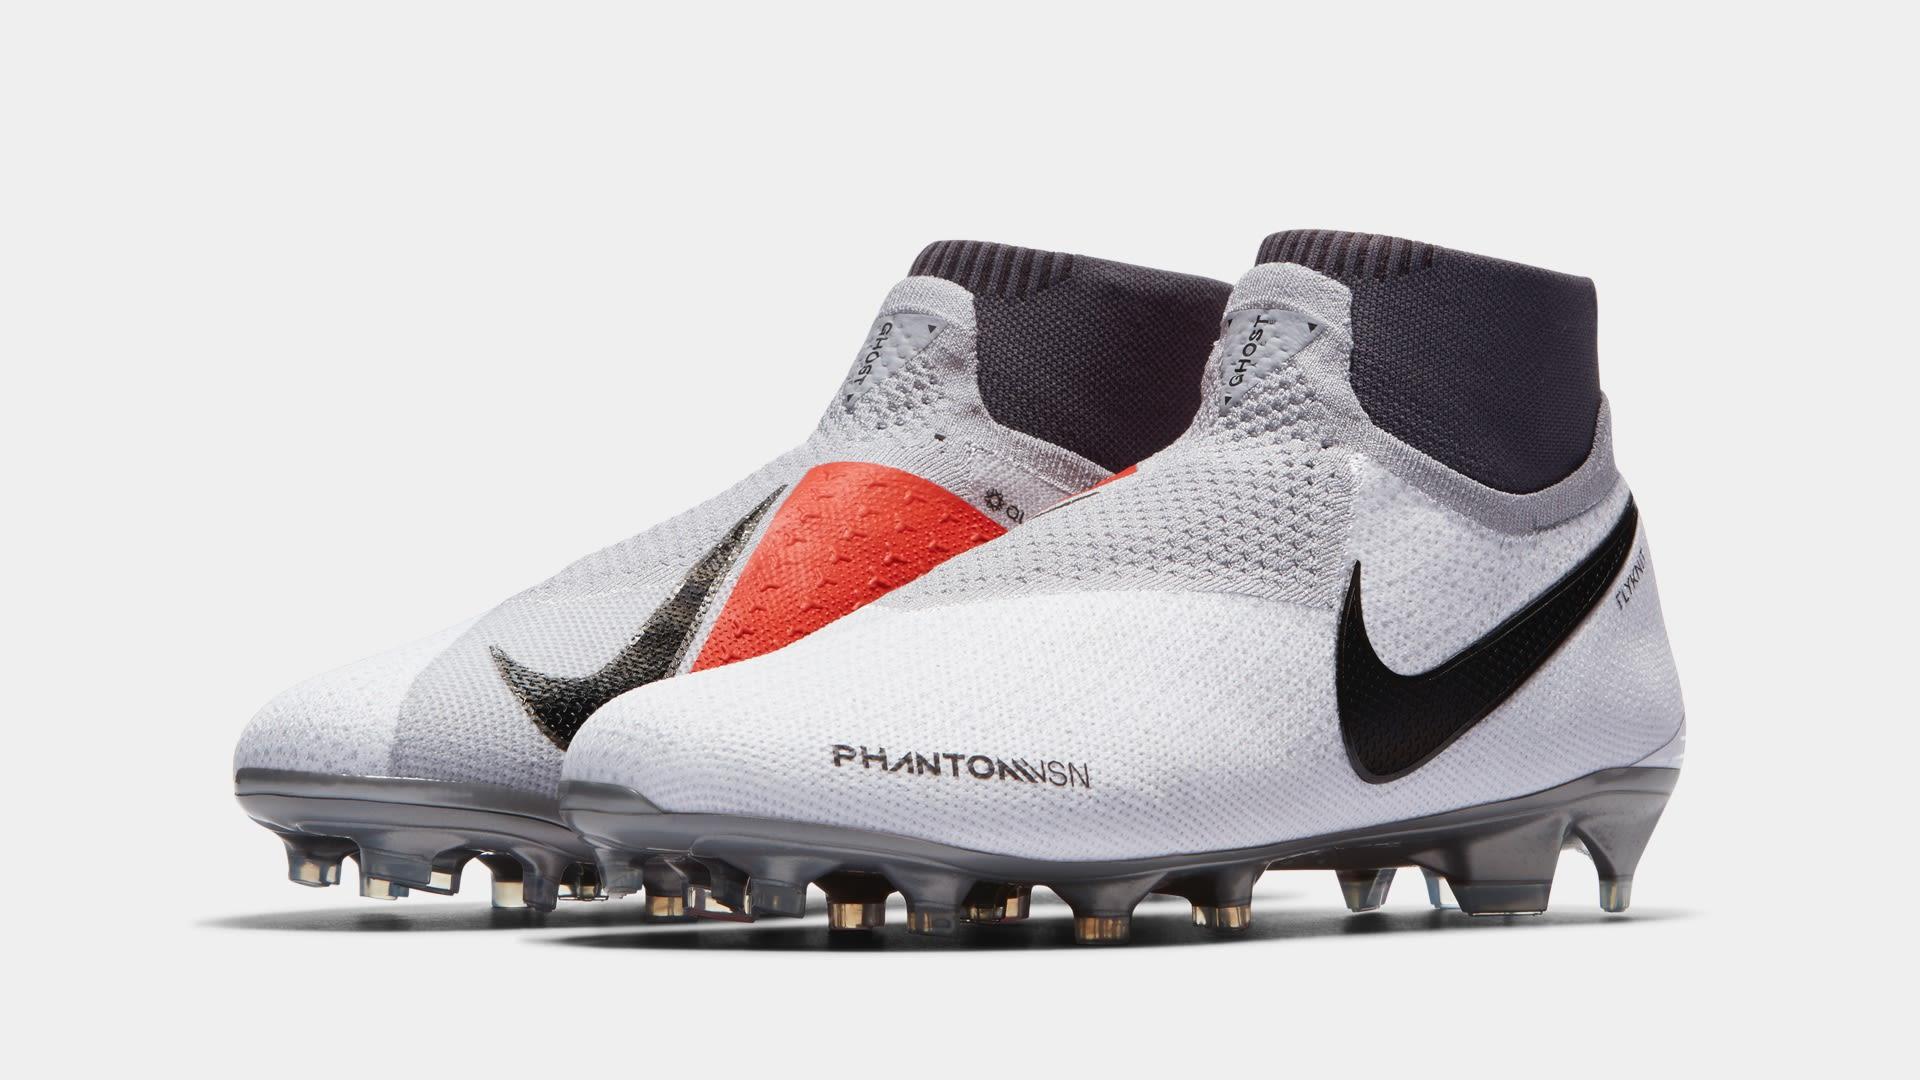 Leon Goretzka Phantomvsn Unboxing Nike Com Se